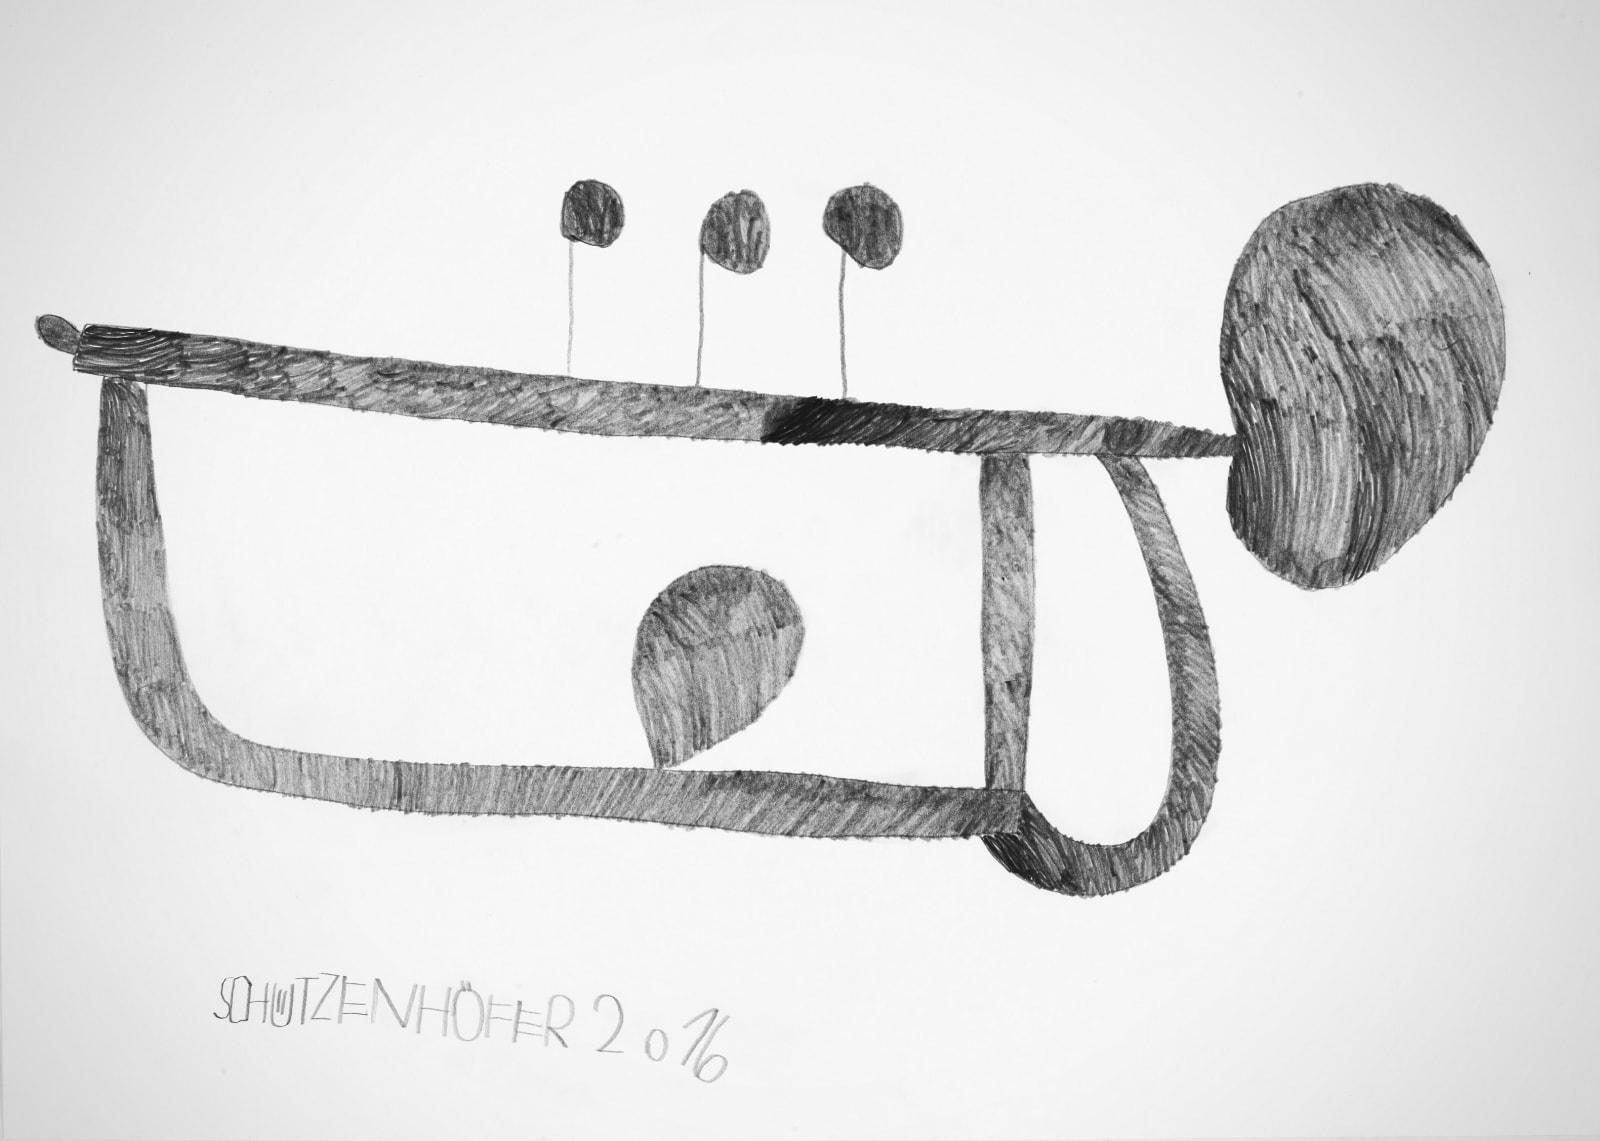 Trumpet, 2016 Graphite on paper 19.7 x 27.5 in. (24.6 x 10.8 cm.) (GSG 118) $7,000